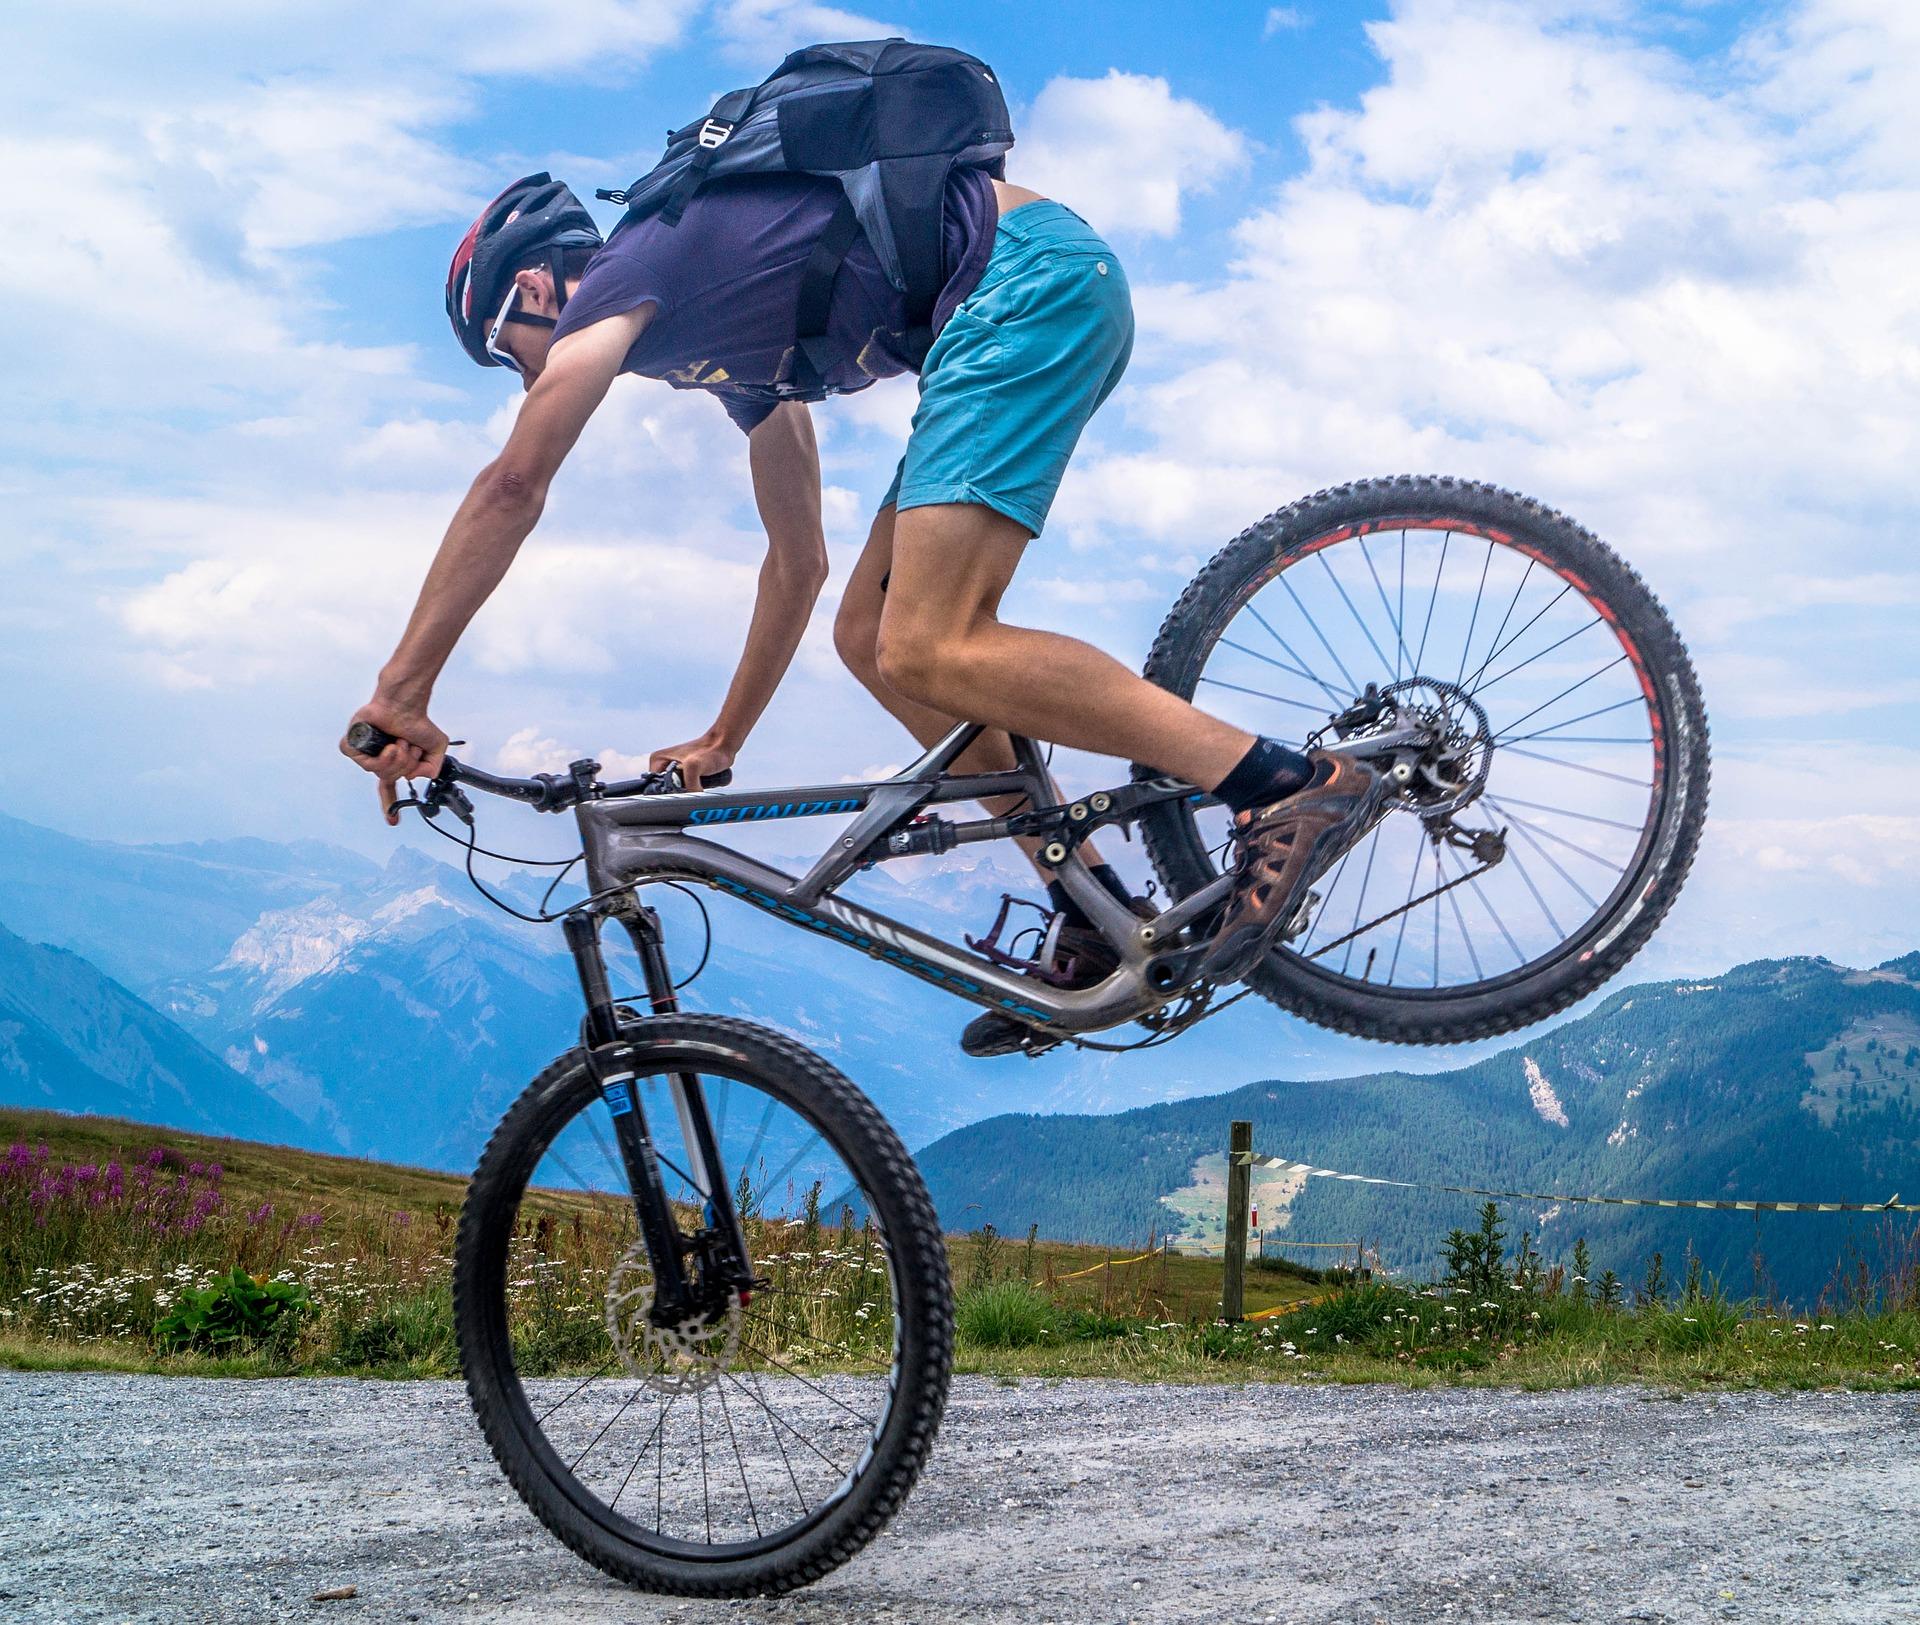 kolo cyklista